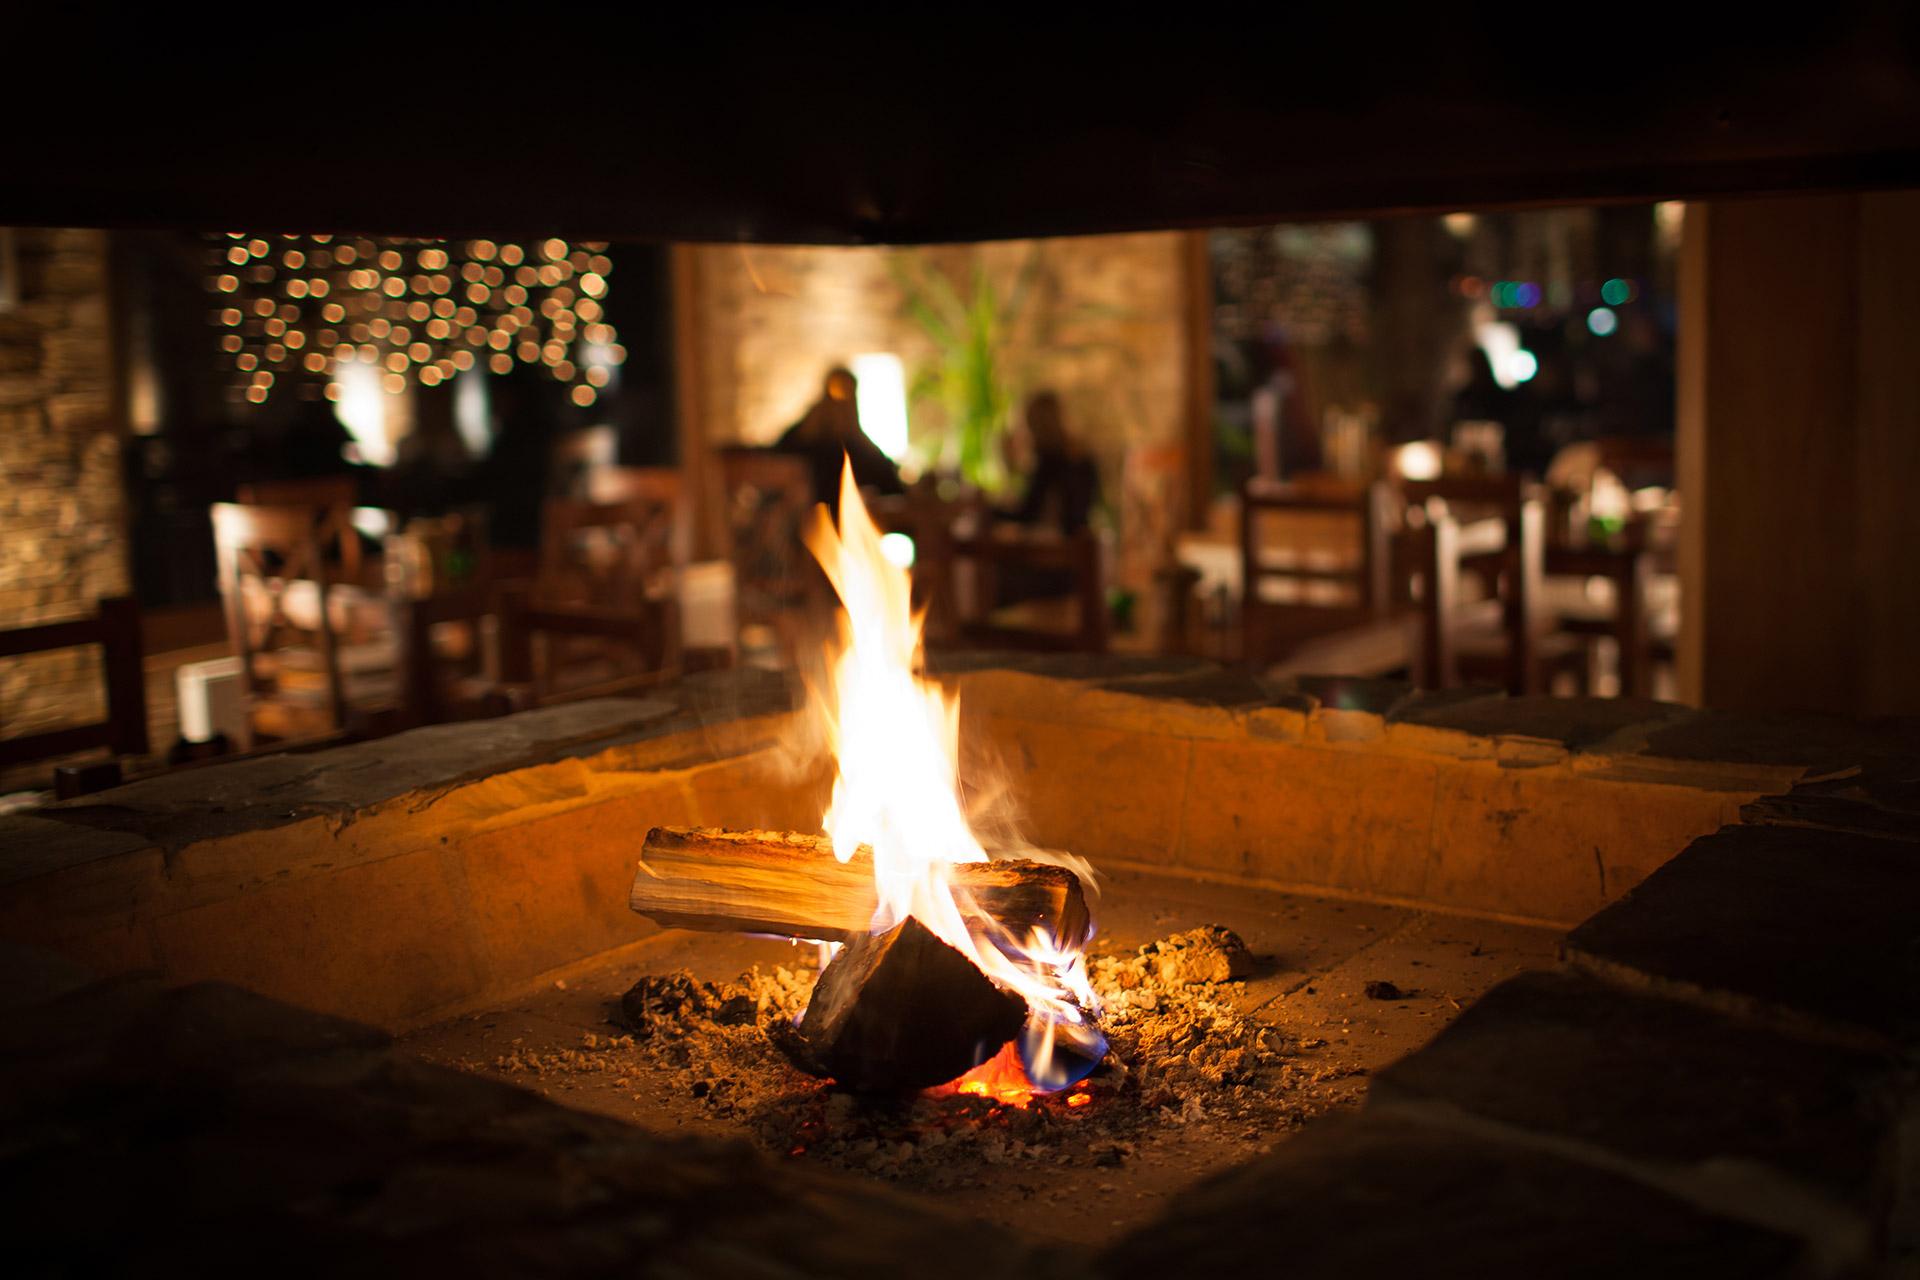 Fireplace blazes on the patio